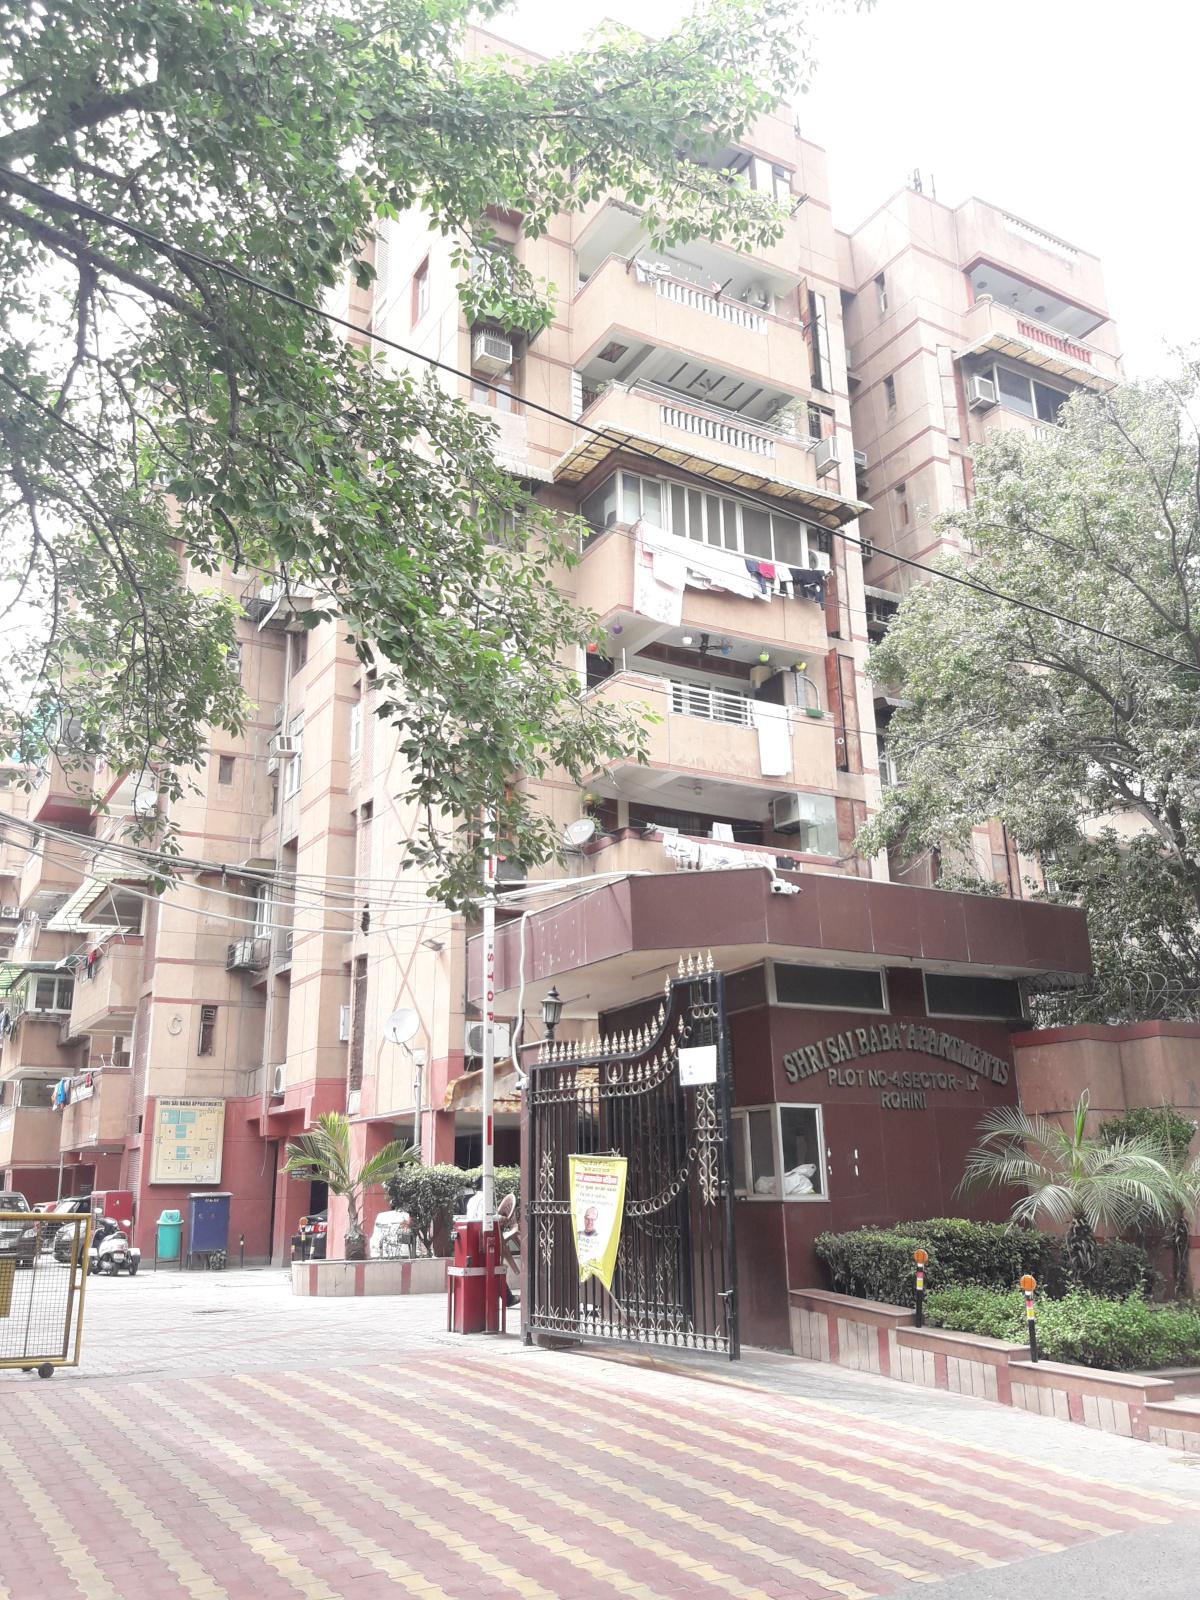 CGHS Shri Sai Baba Apartments in Sector 9 Rohini, Delhi